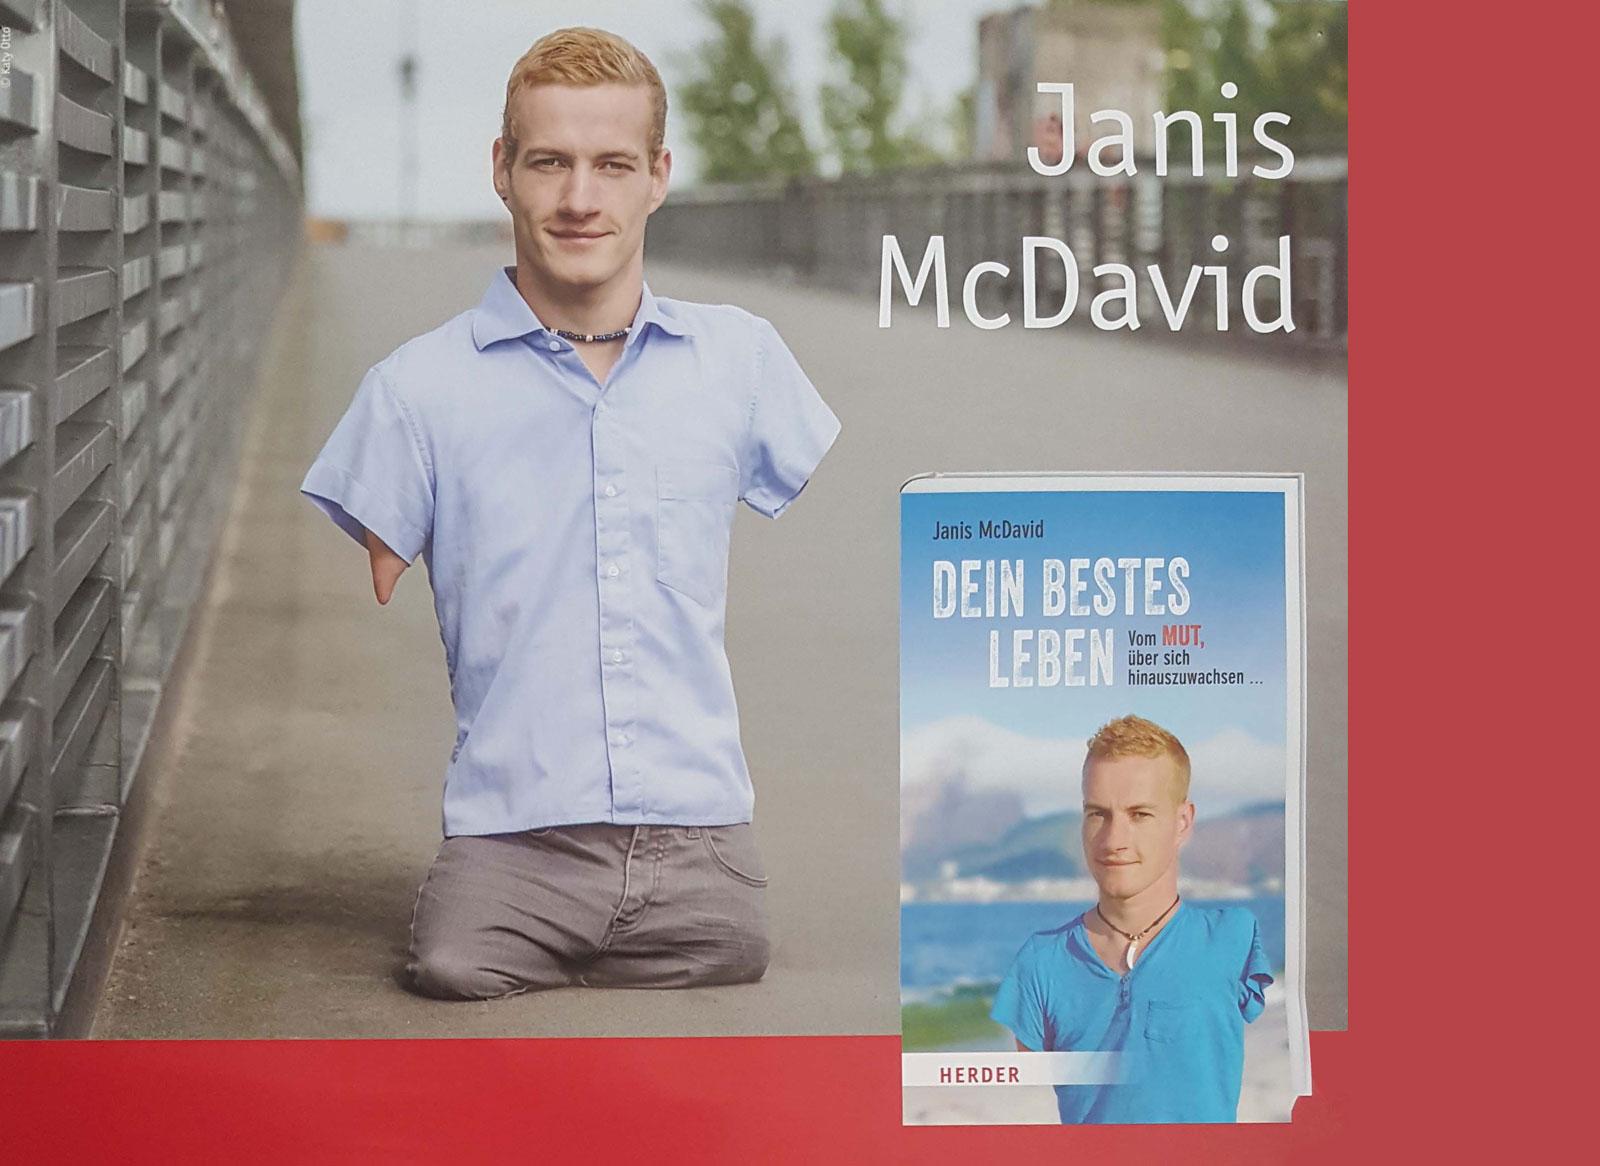 Janis Mcdavid